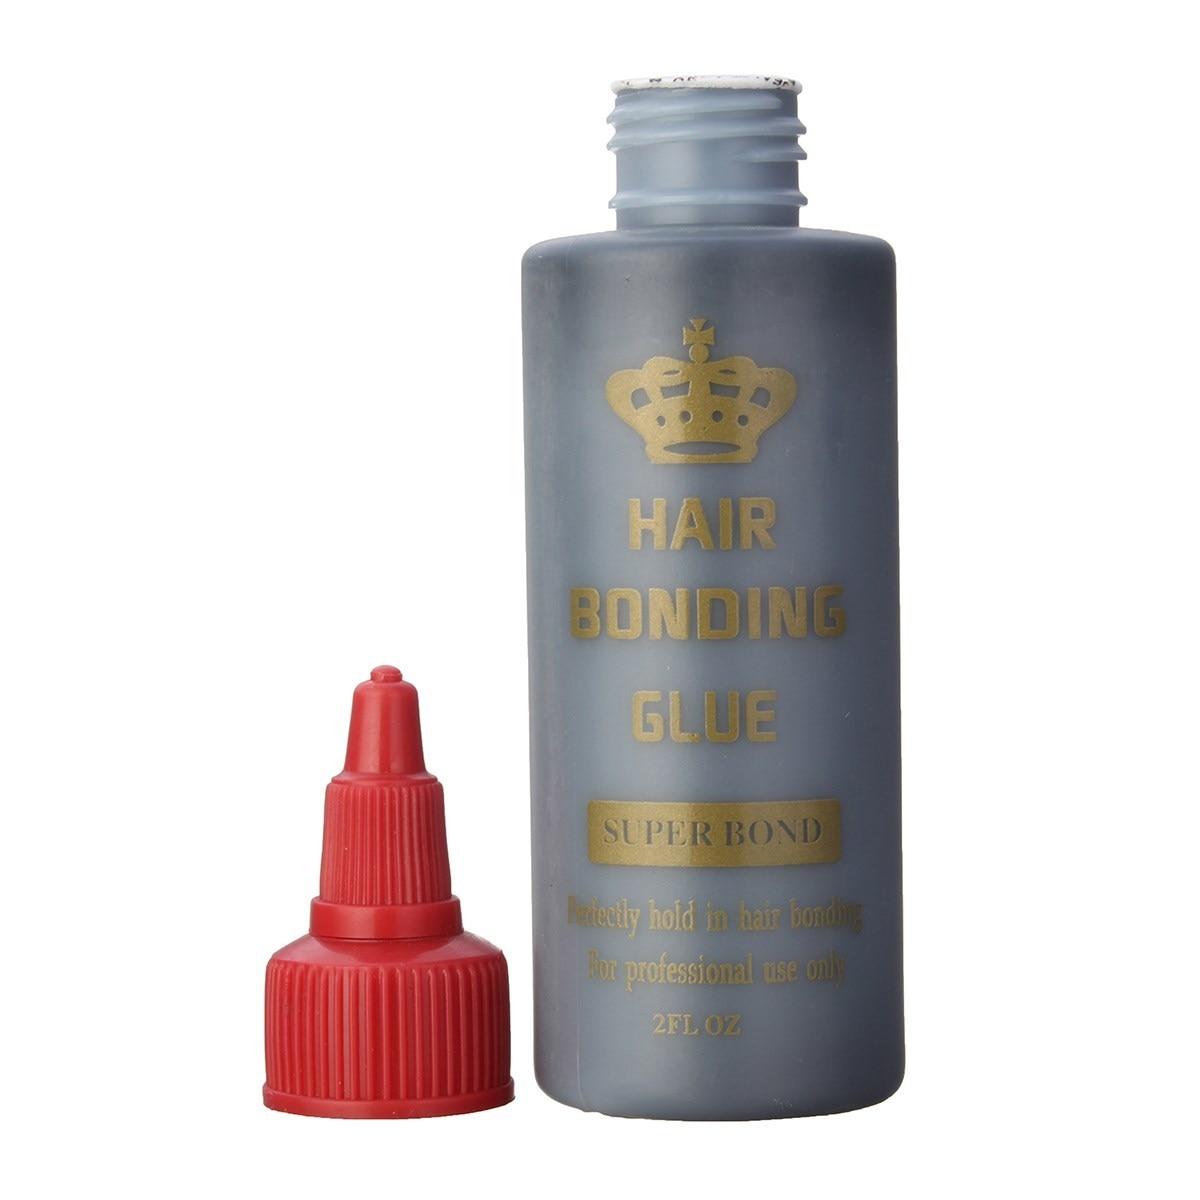 Hair Bonding Glue Super Bonding Liquid Glue For Weaving Weft Wig Hair Extensions Tools Professional Salon Use 1bottle Massage